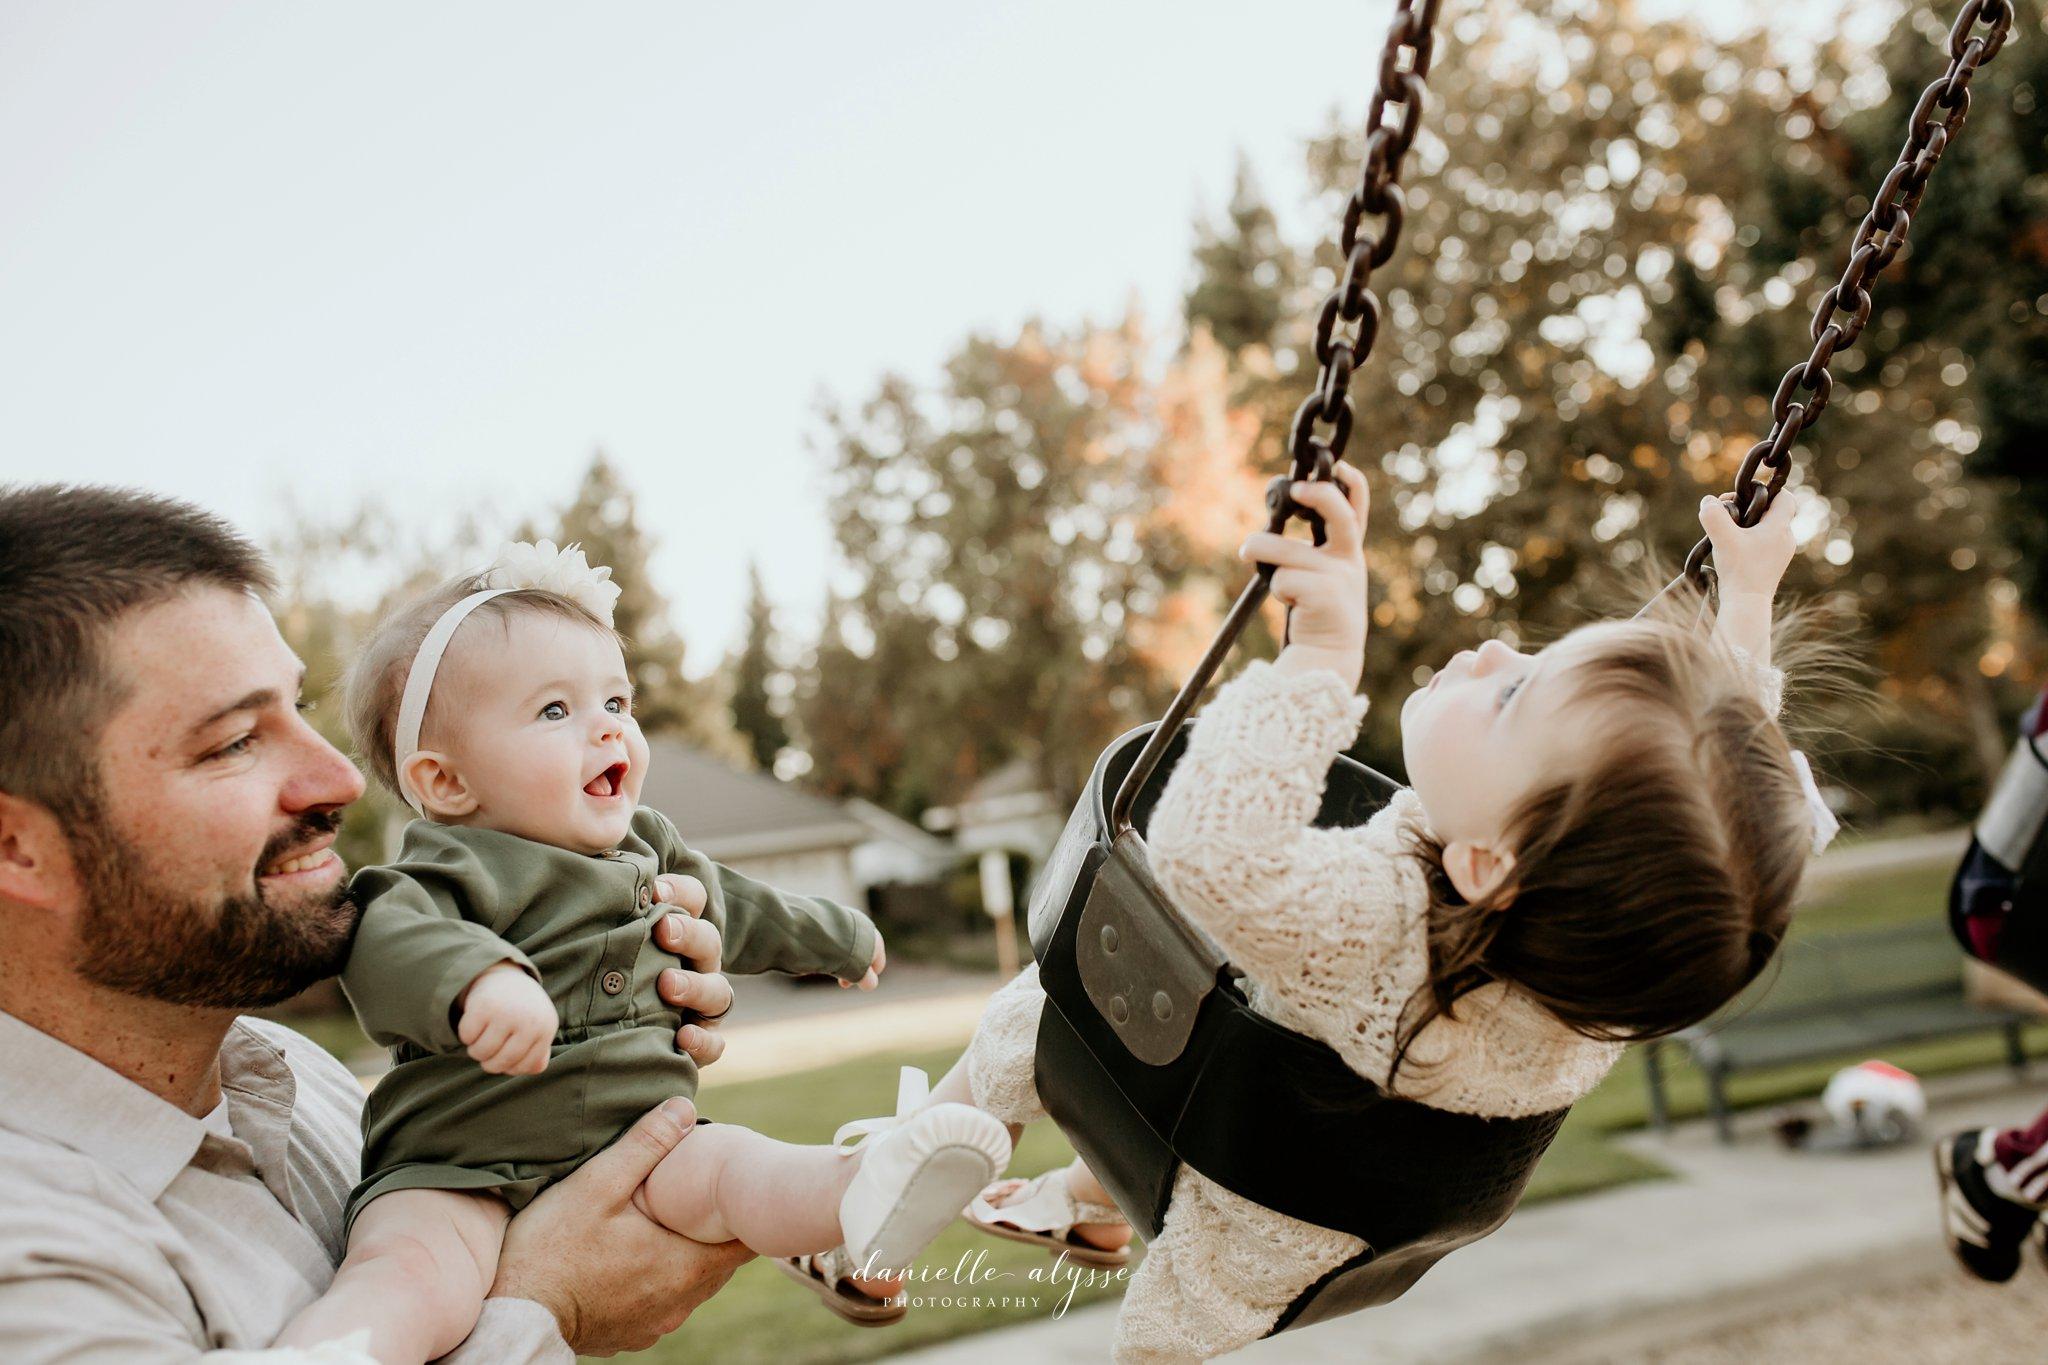 181021_fall_family_portrait_elk_grove_hill_park_monica_danielle_alysse_photography_42_WEB.jpg